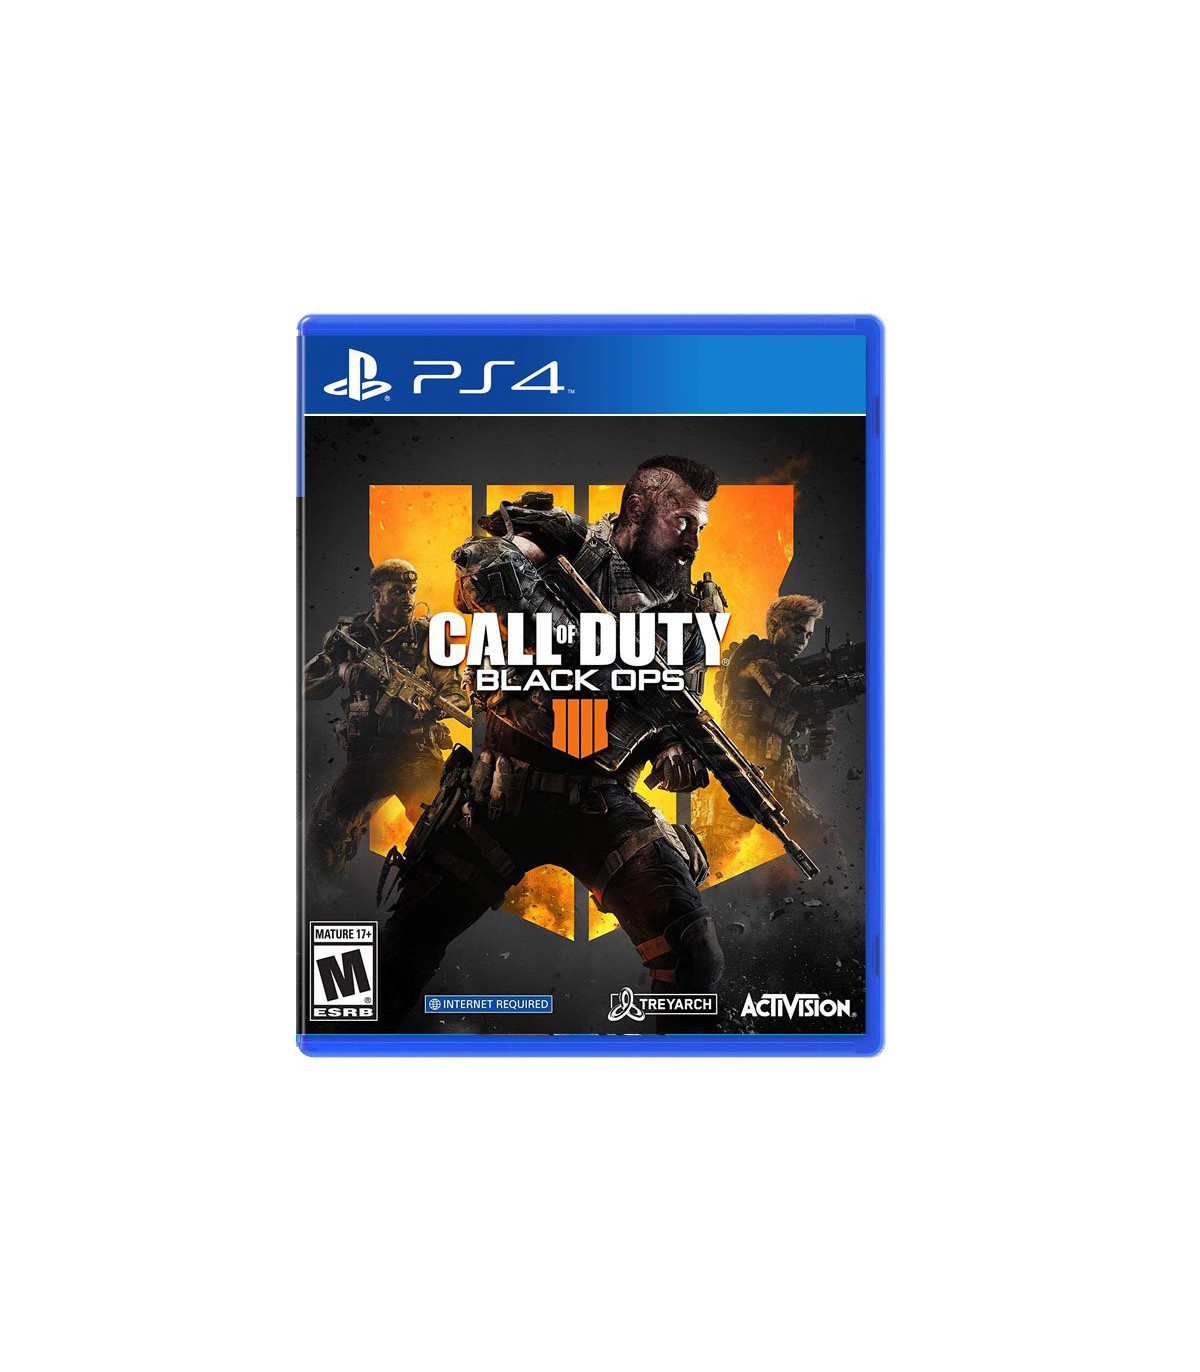 بازی Call of Duty: Black Ops 4 - پلی استیشن 4